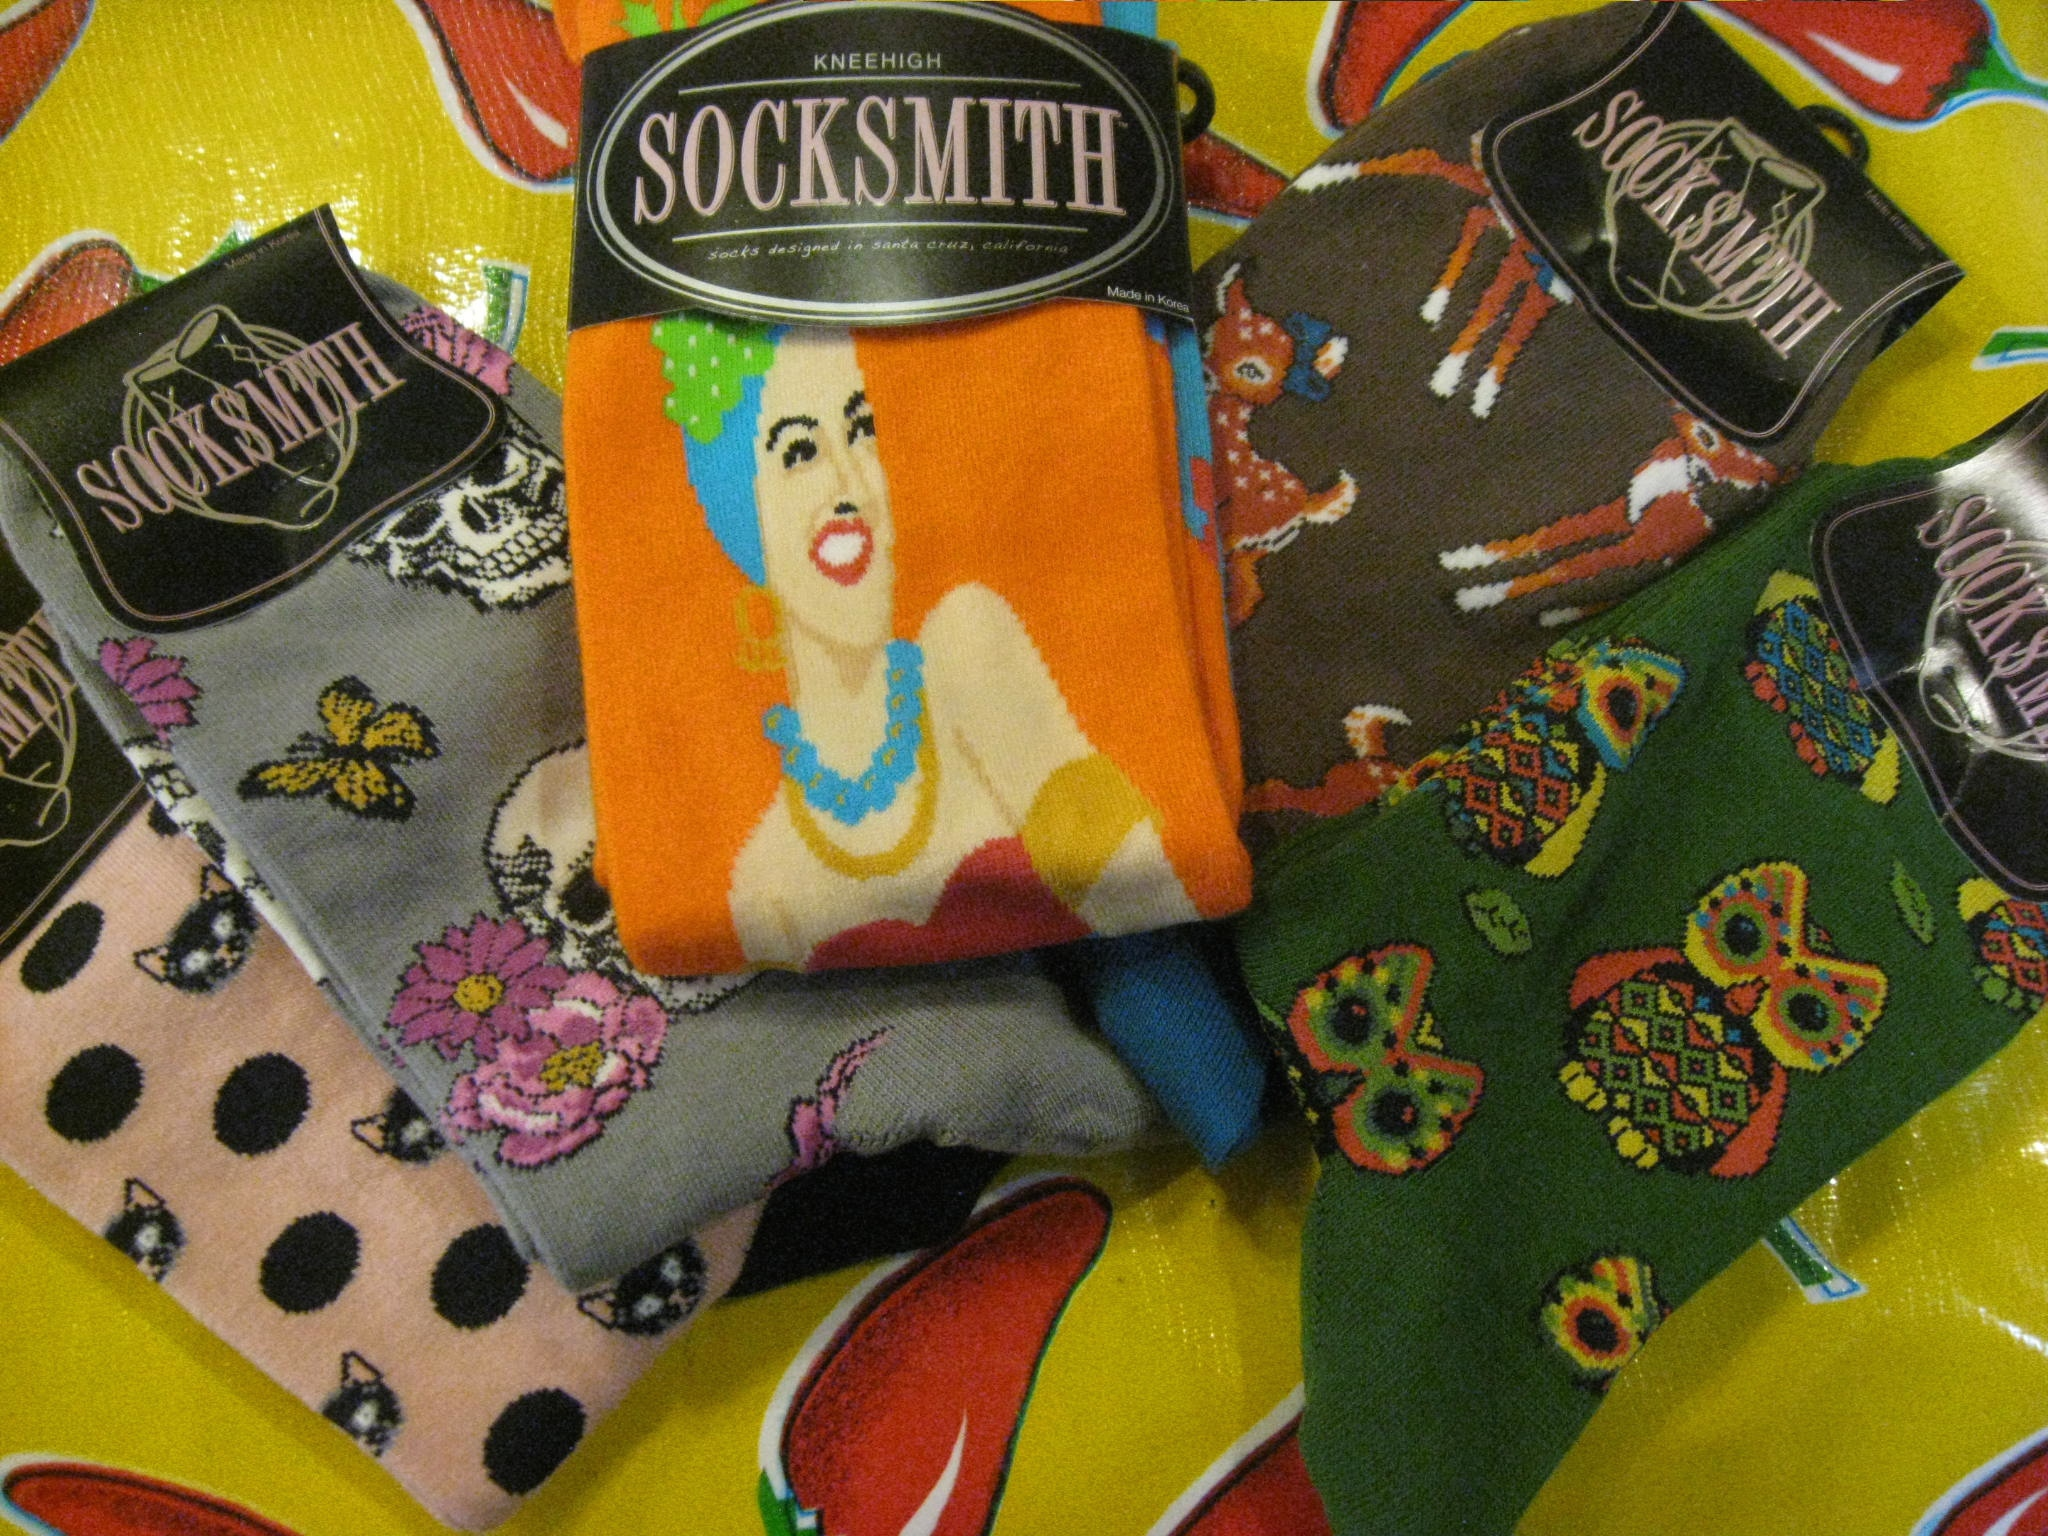 Cool new folk art (and socks!)